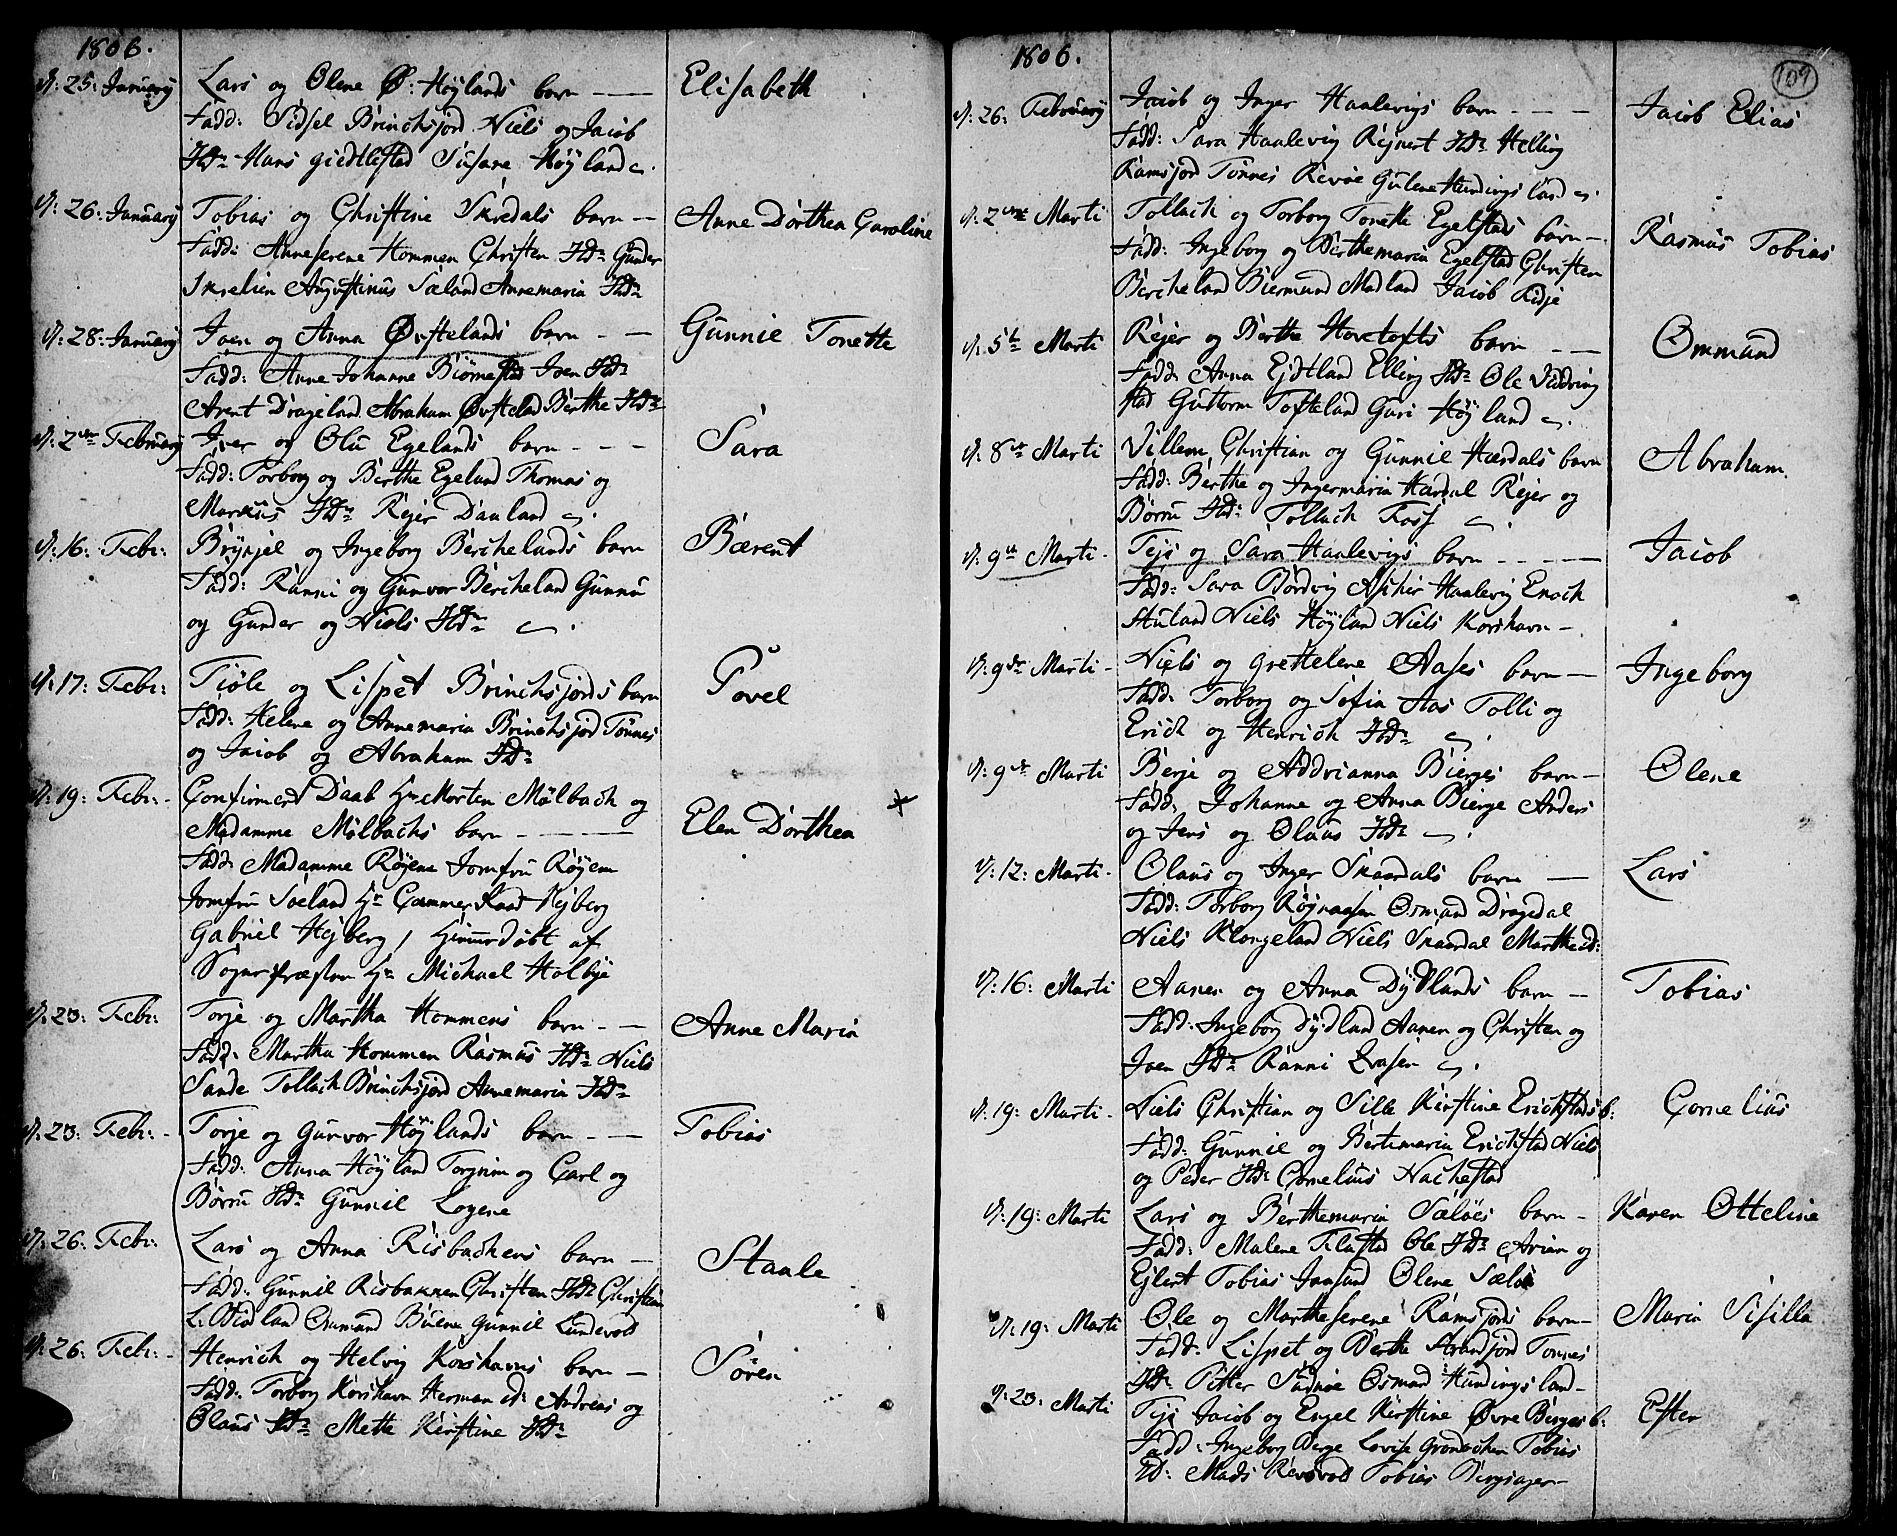 SAK, Lyngdal sokneprestkontor, F/Fa/Fac/L0004: Ministerialbok nr. A 4, 1780-1815, s. 109